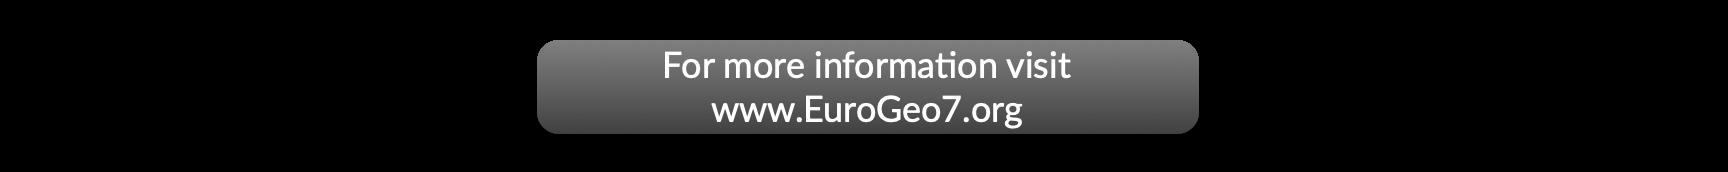 EuroGeo7 website